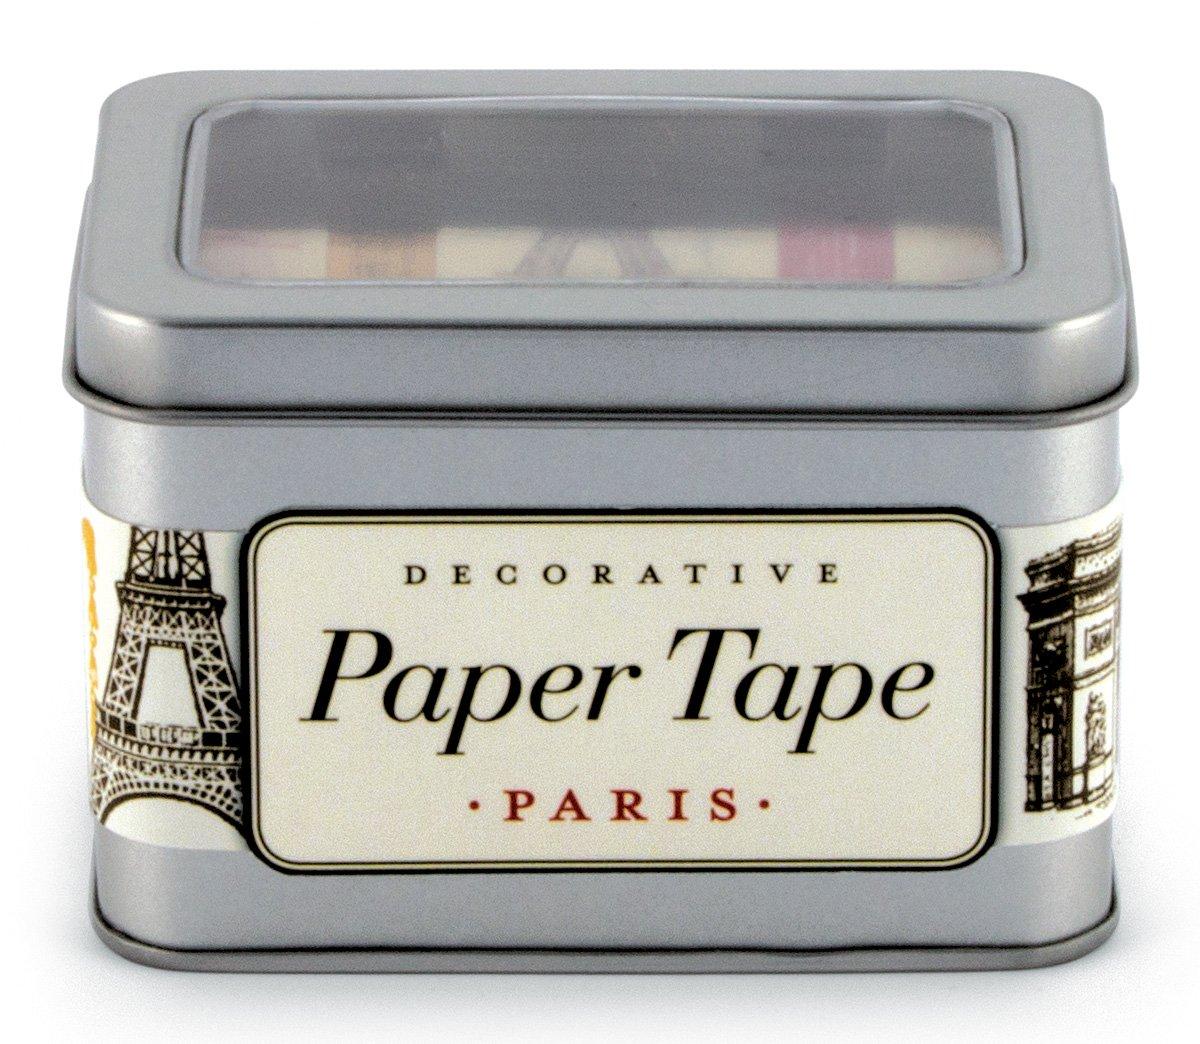 Cavallini Paris Decorative Paper Tape 5-Assorted Rolls 16-Yard Per Roll Cavallini & Company PT/PAR Notecards Postcards